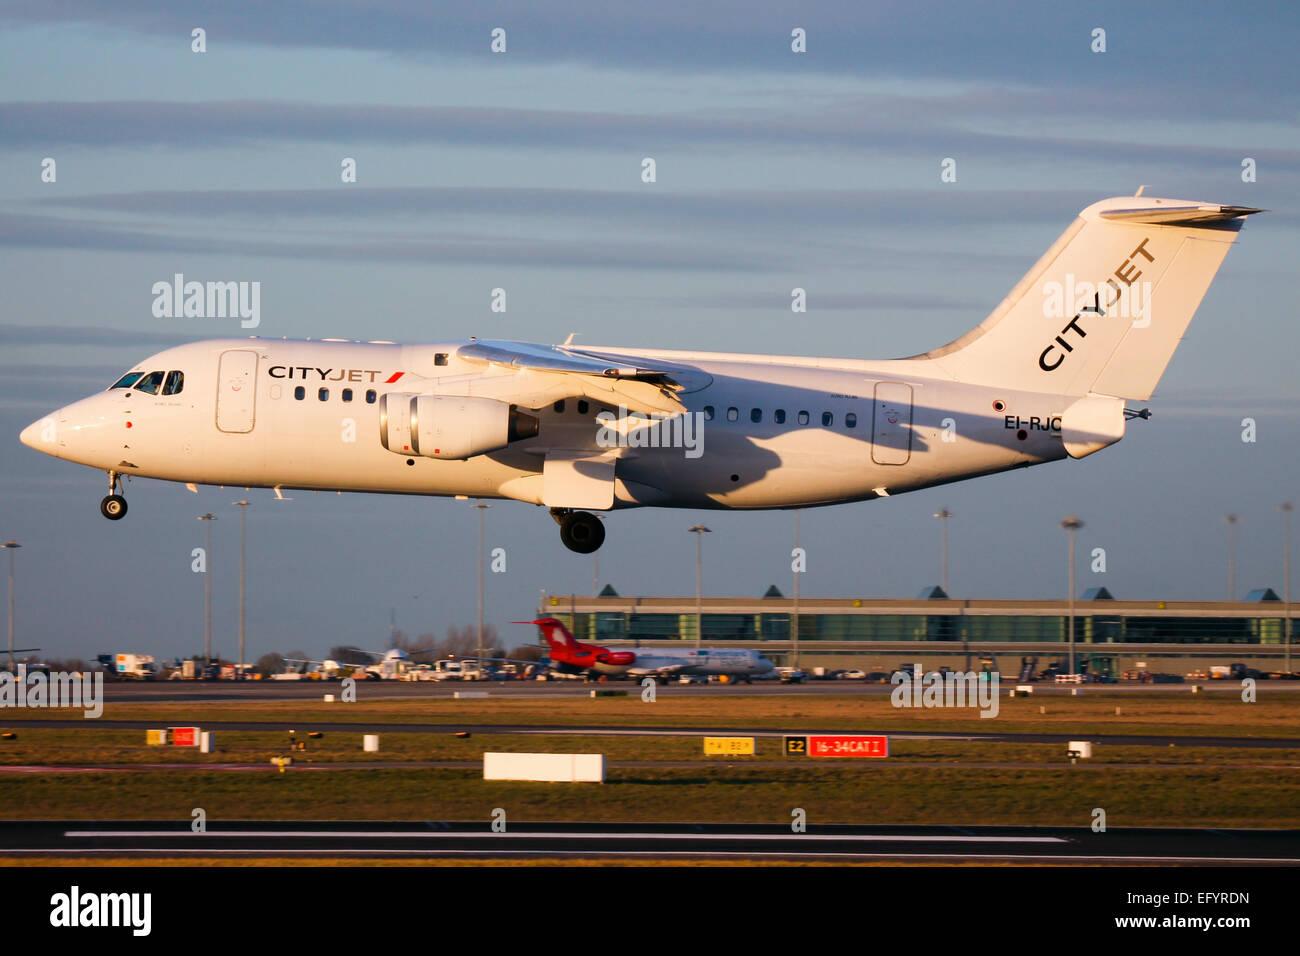 CityJet British Aerospace RJ85 approaches runway 28 at Dublin airport. - Stock Image